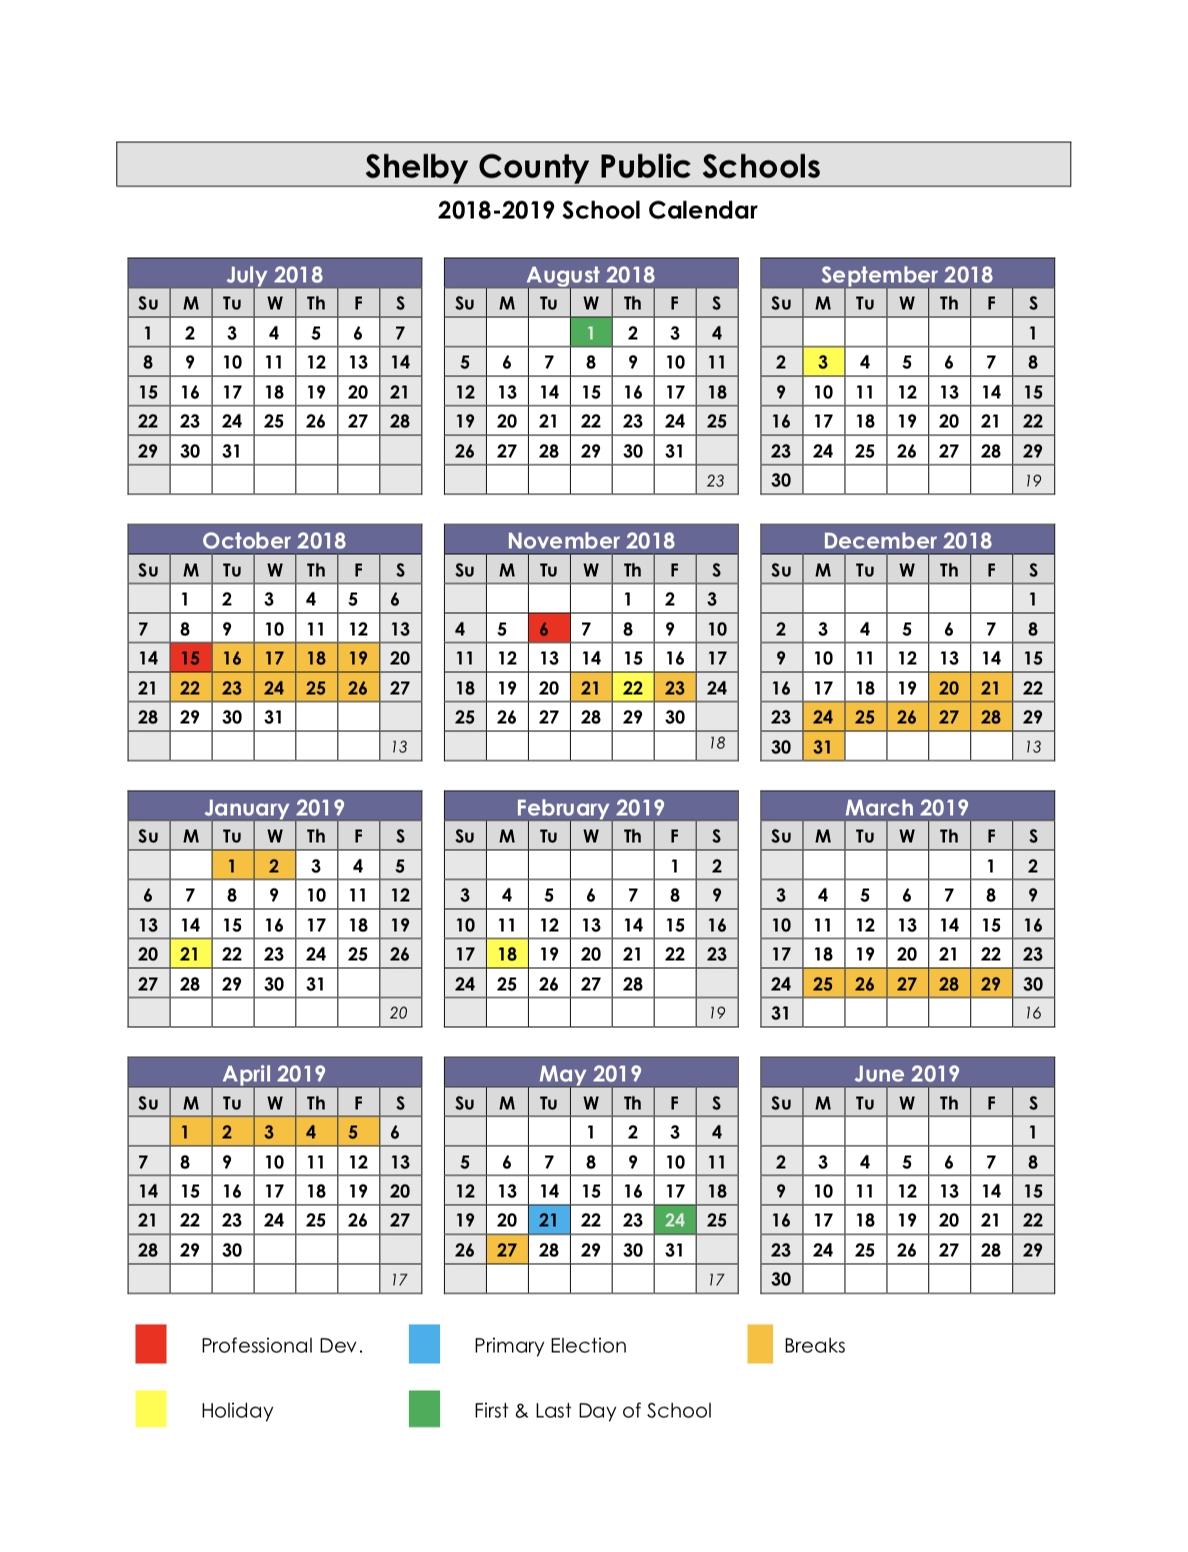 School Year Calendars / 2018-2019 School Calendar Calendar 2019 School